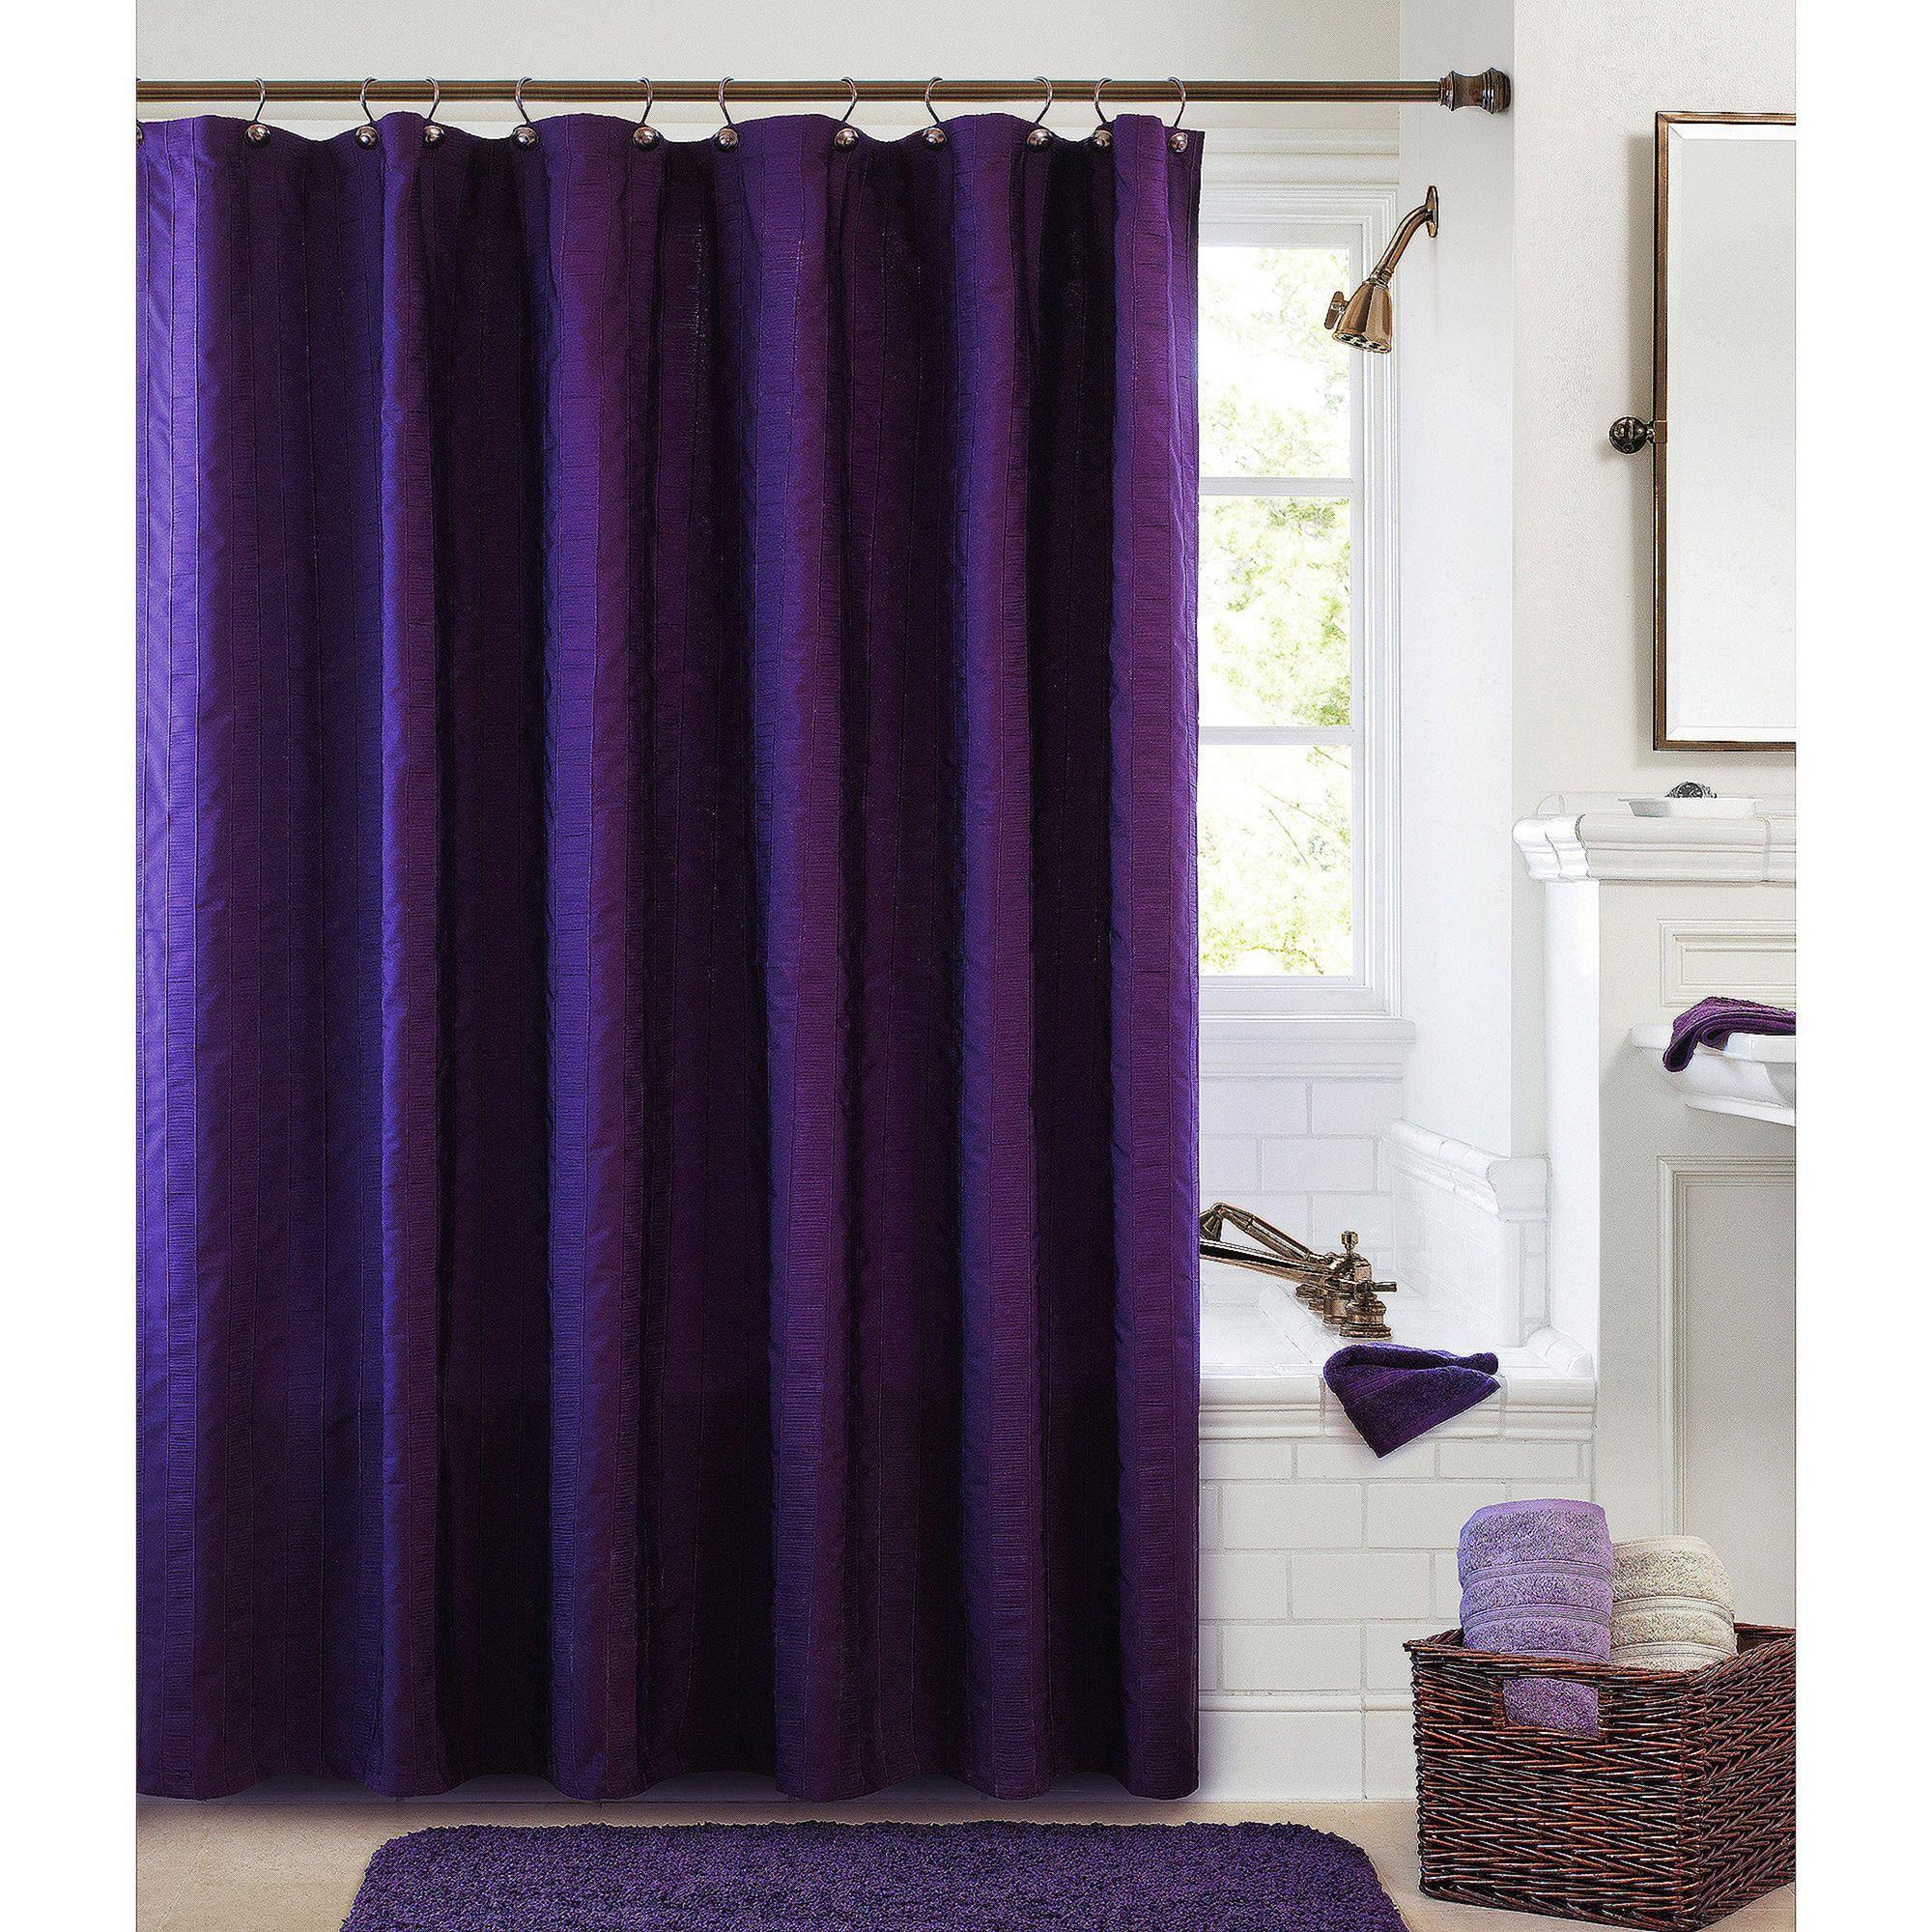 Astounding 20 Astonishing Bathroom Shower With Curtain And Rugs Sets Decoredo